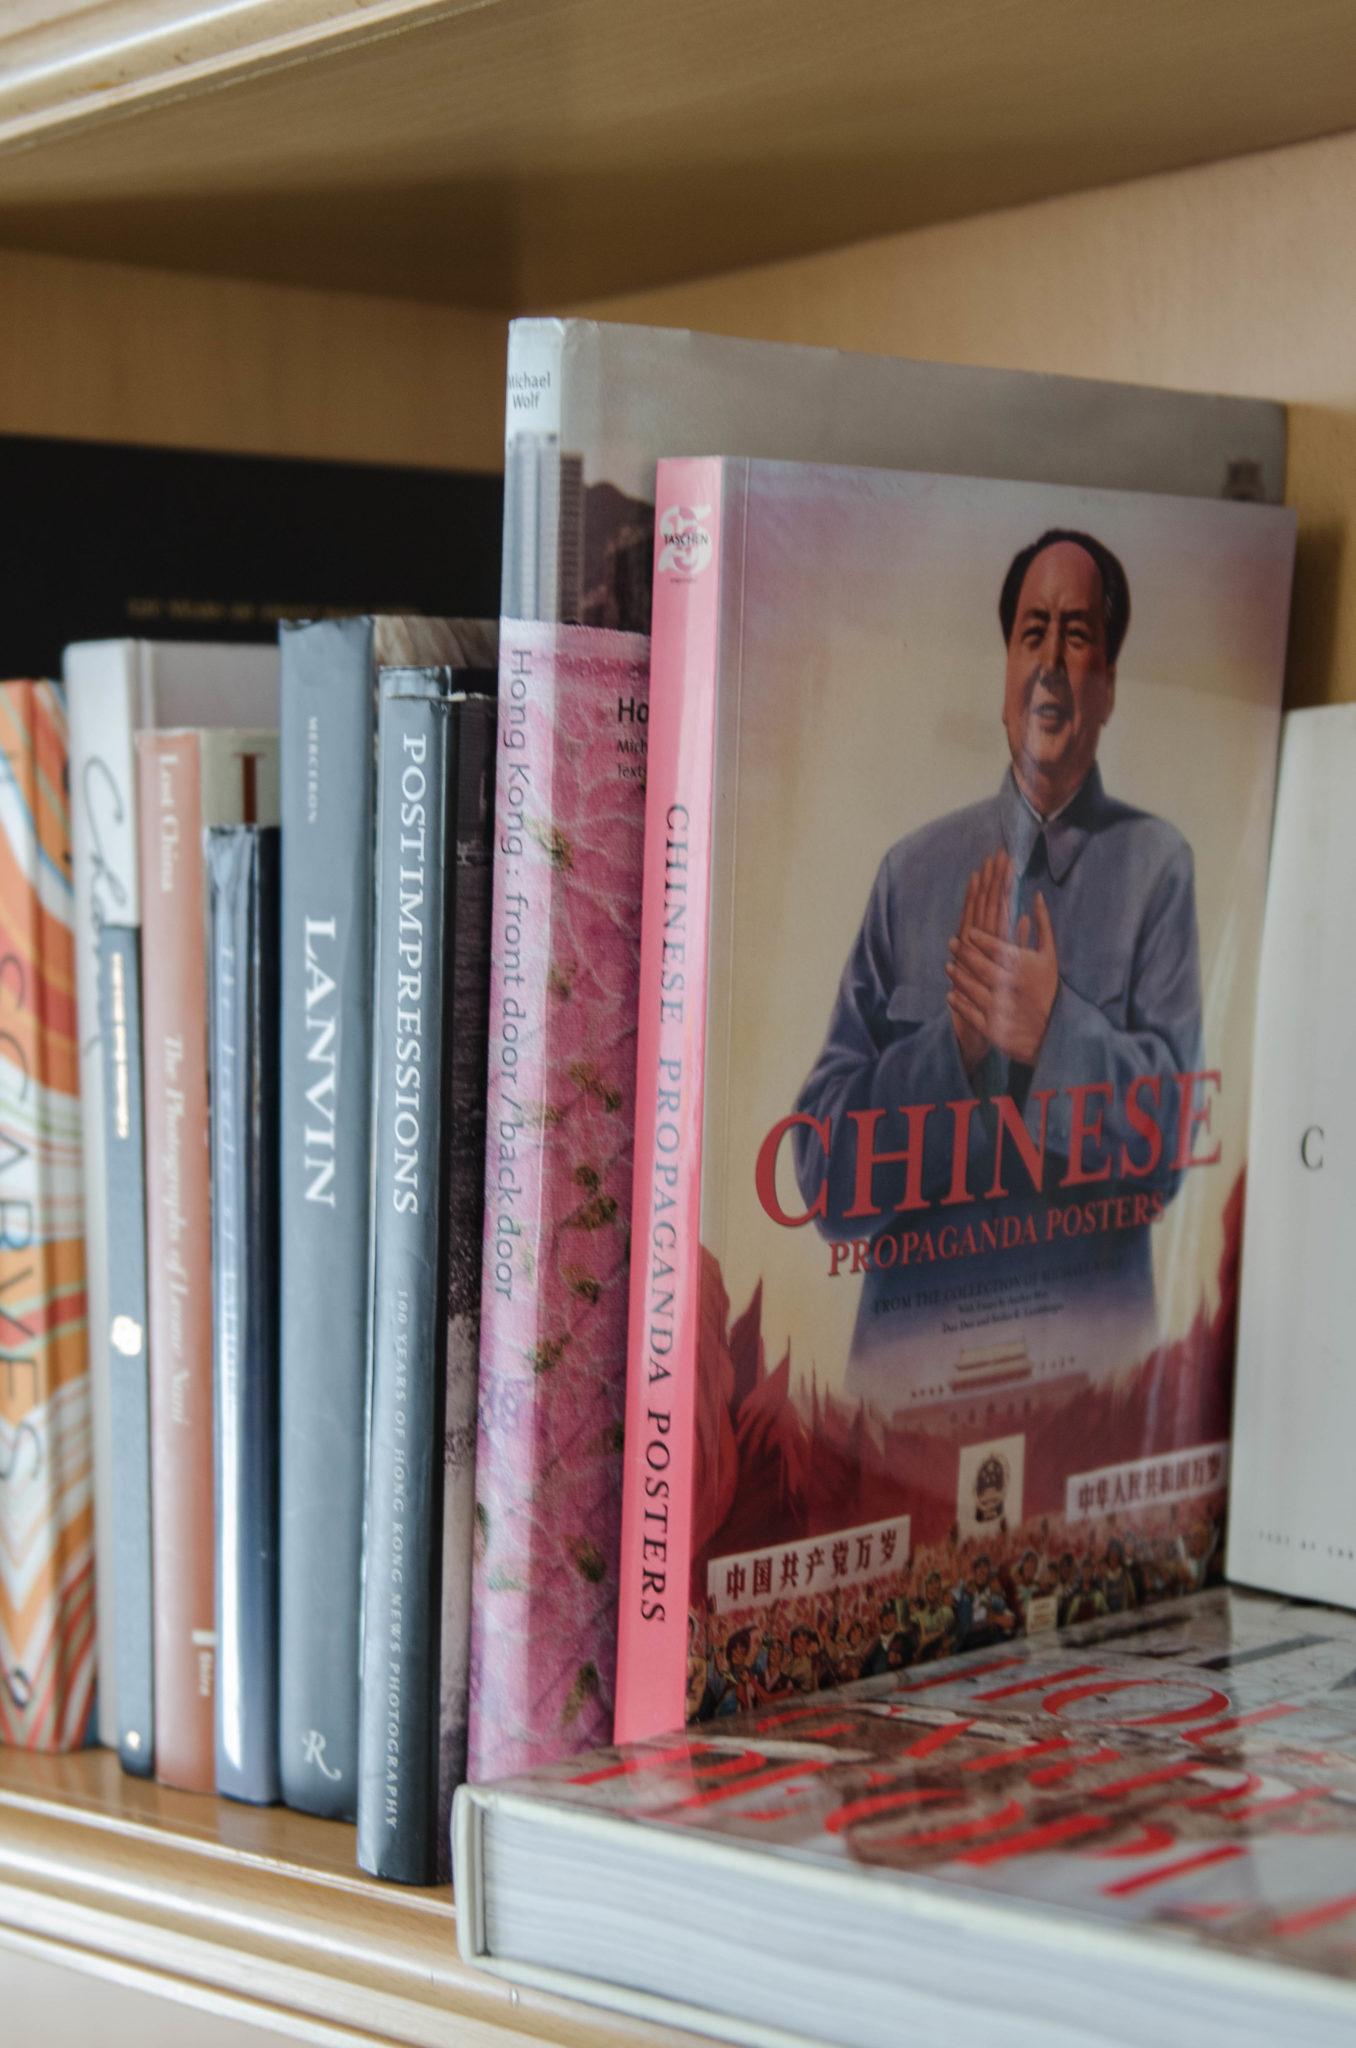 Lanson Place Hotel Hongkong: Die Buchauswahl in der Bibliothek ist sehr variabel